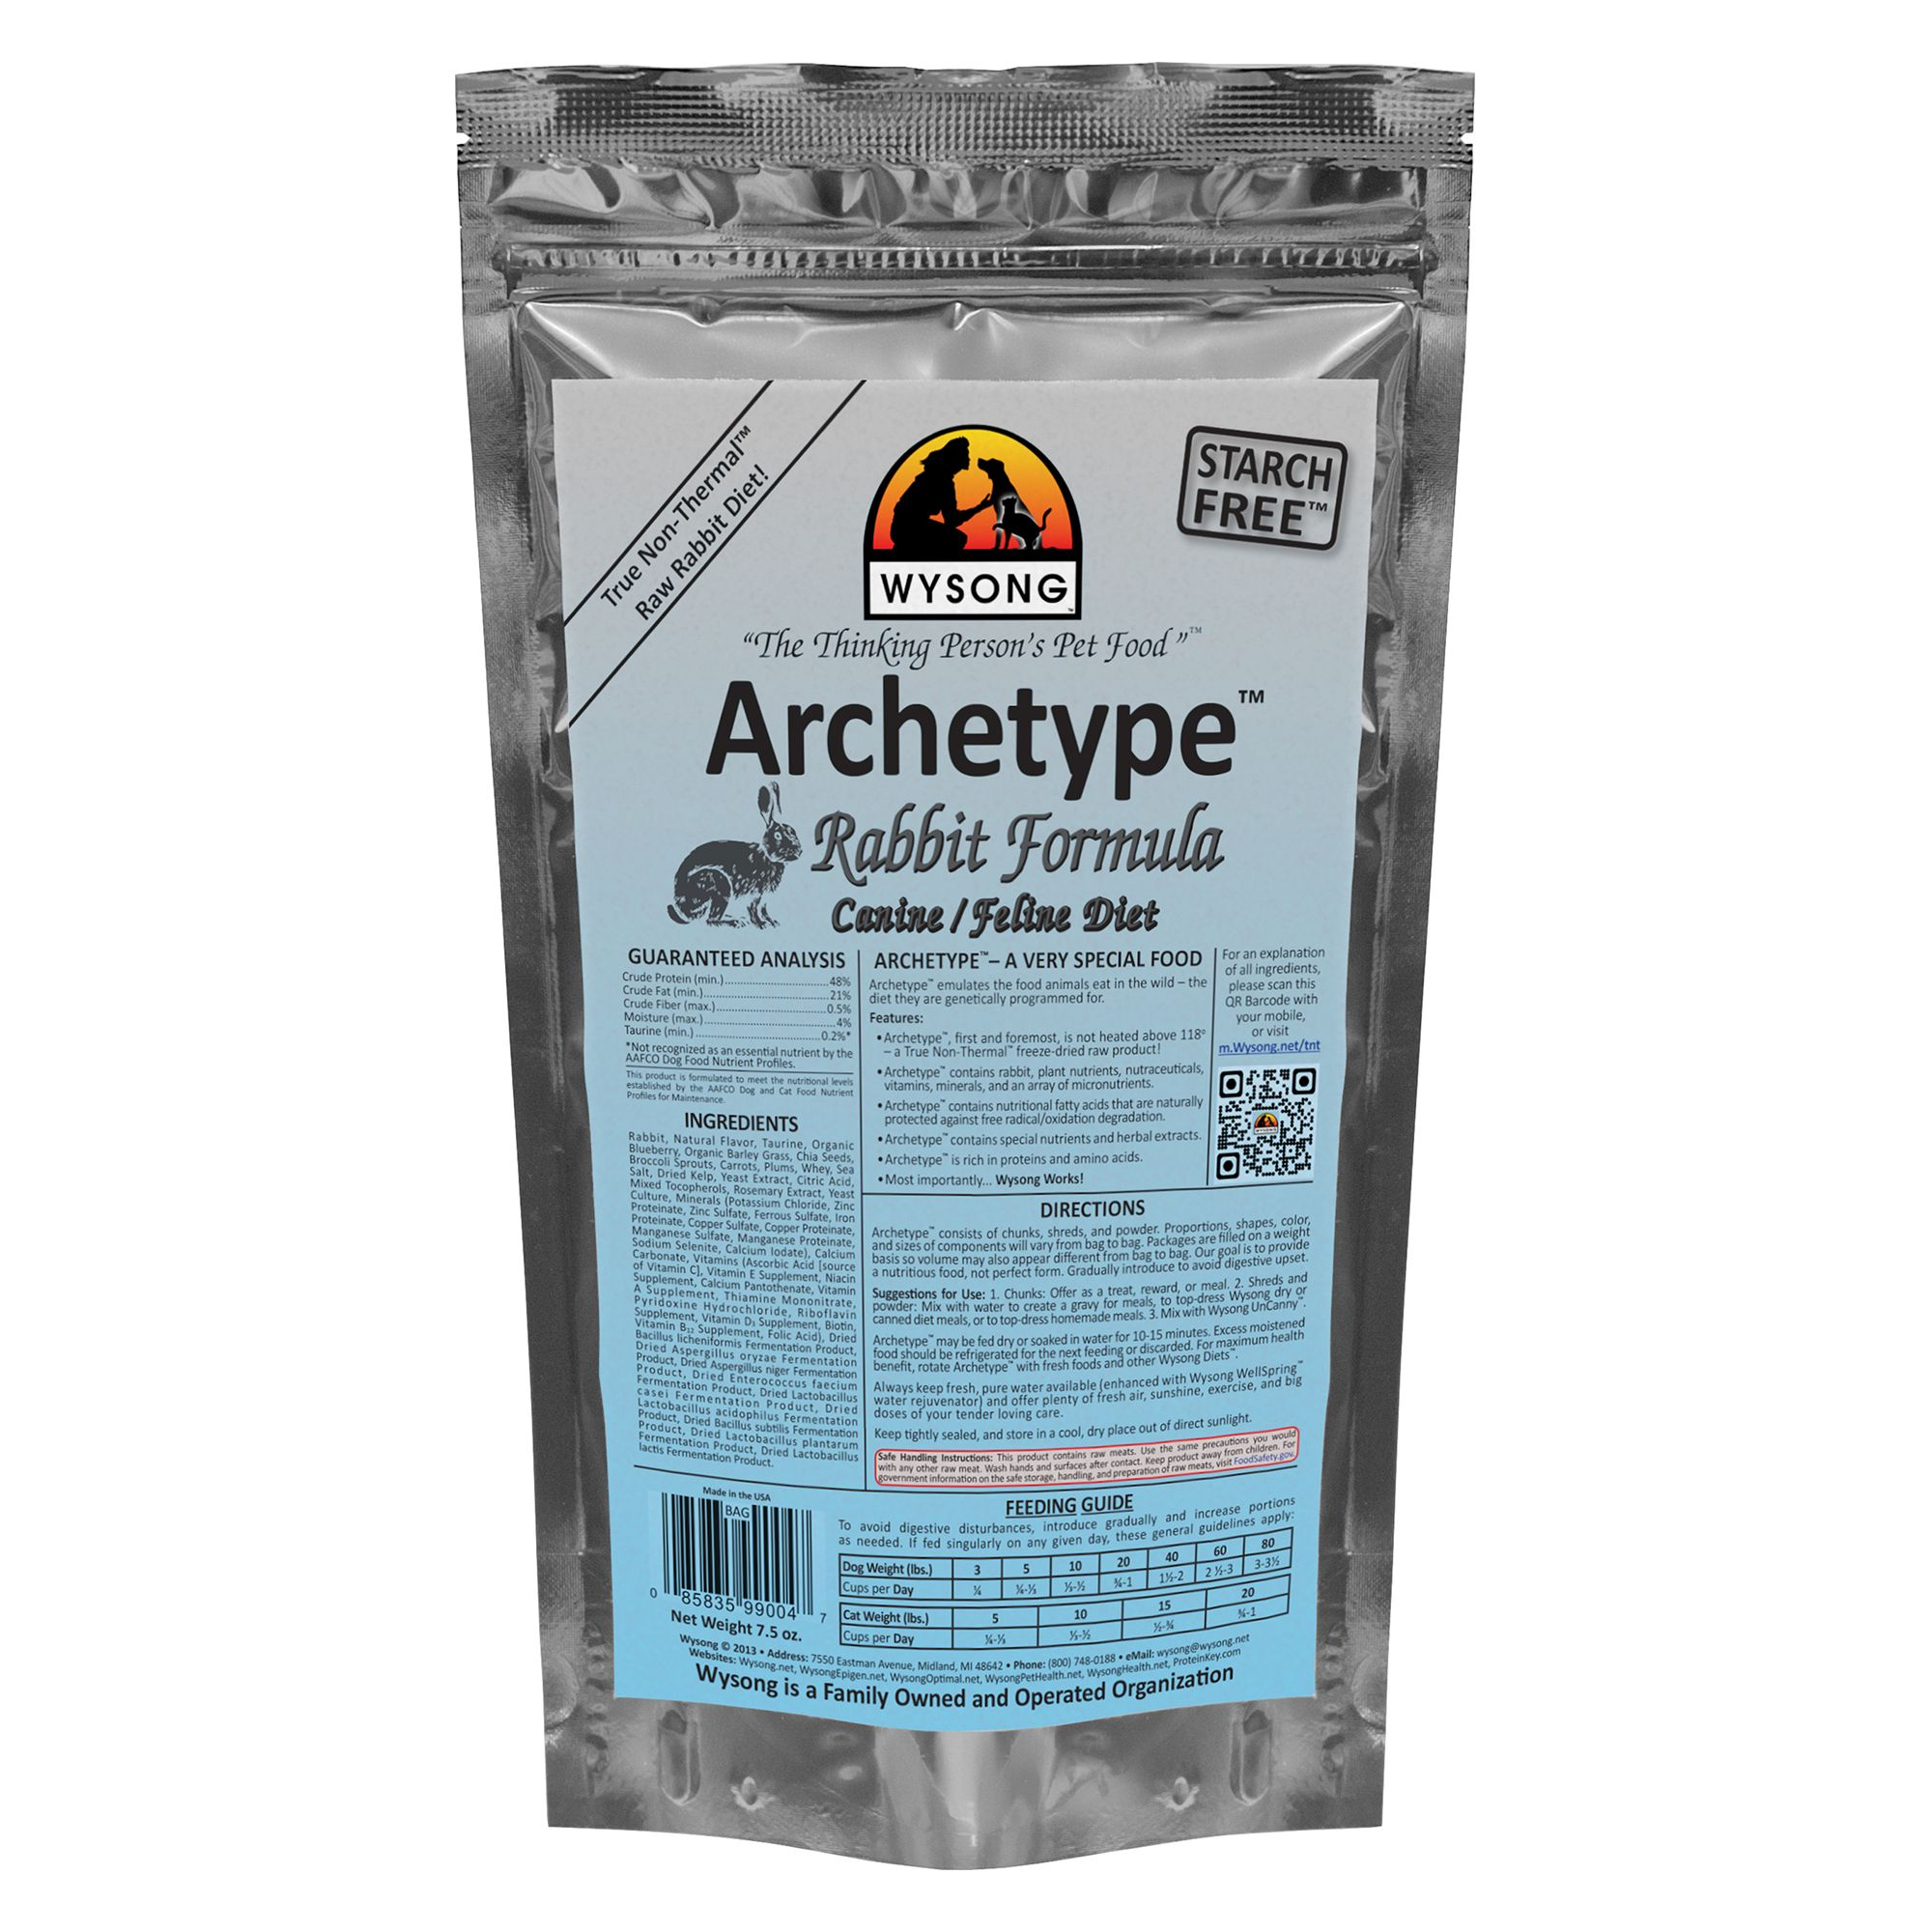 Wysong Archetype Freeze Dried Raw Dog and Cat Food - Rabbit size: 7.5 Oz 5270603